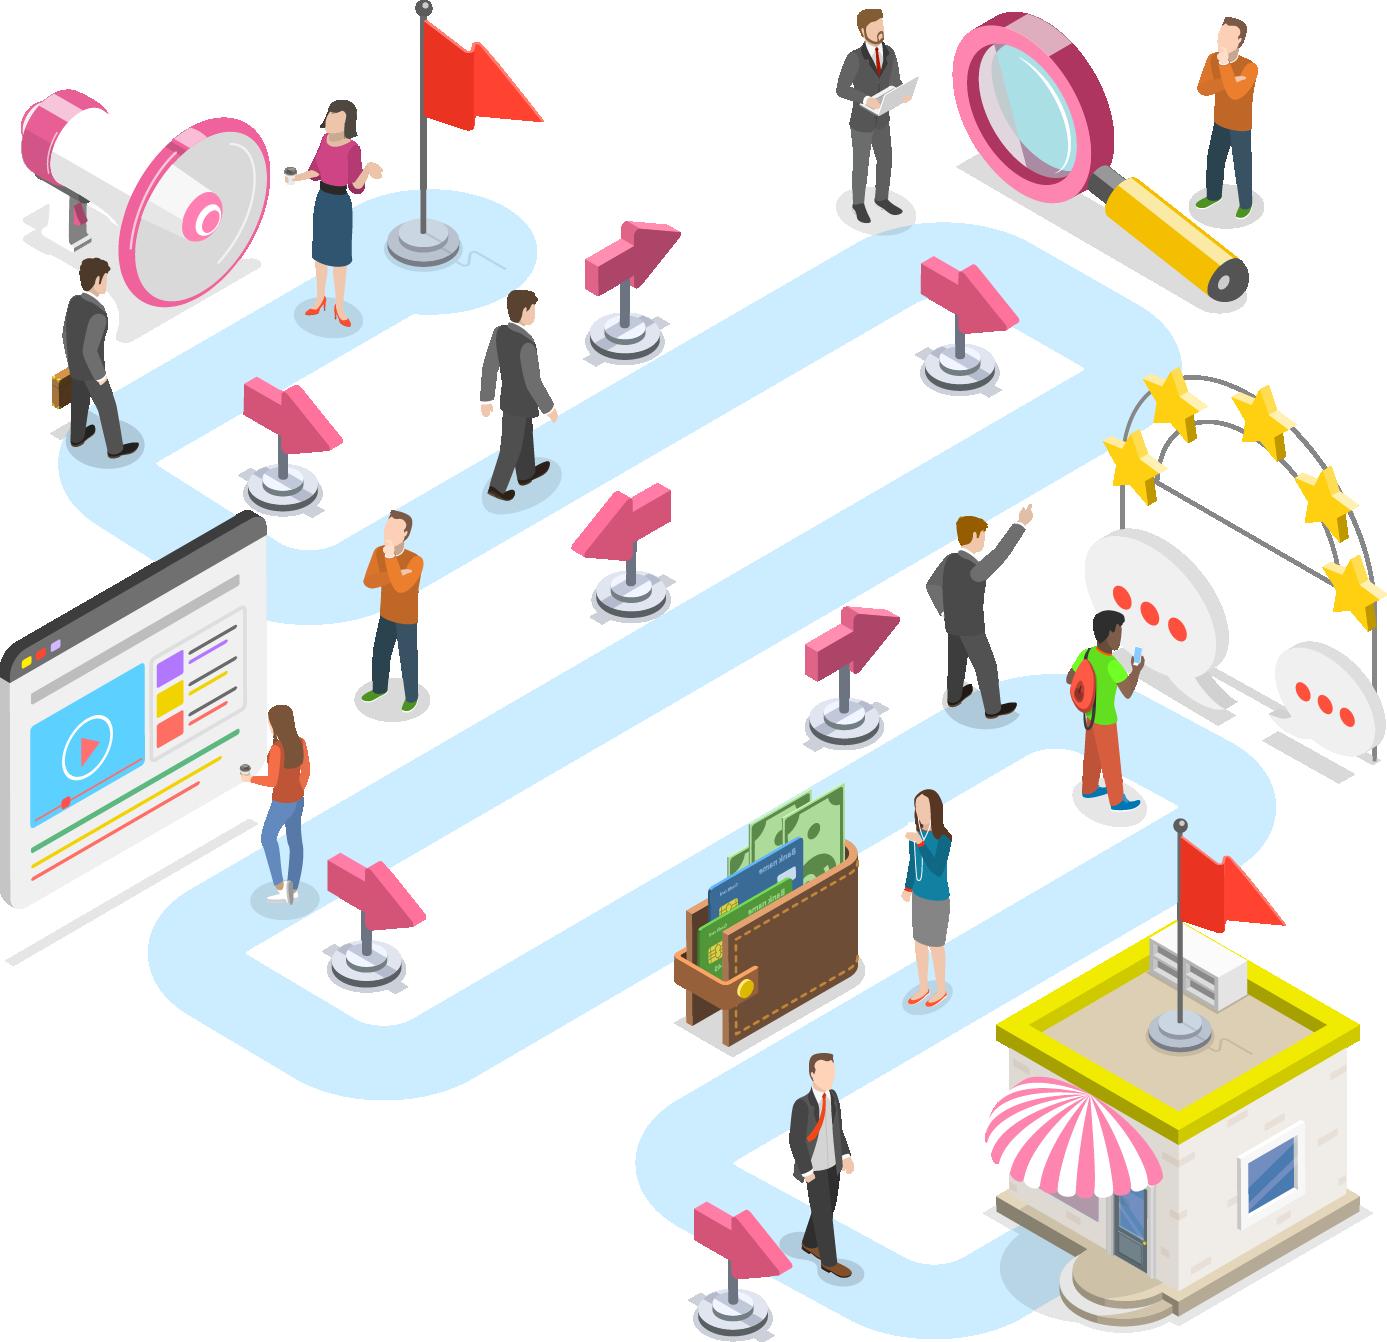 Customer Journey [Converted]